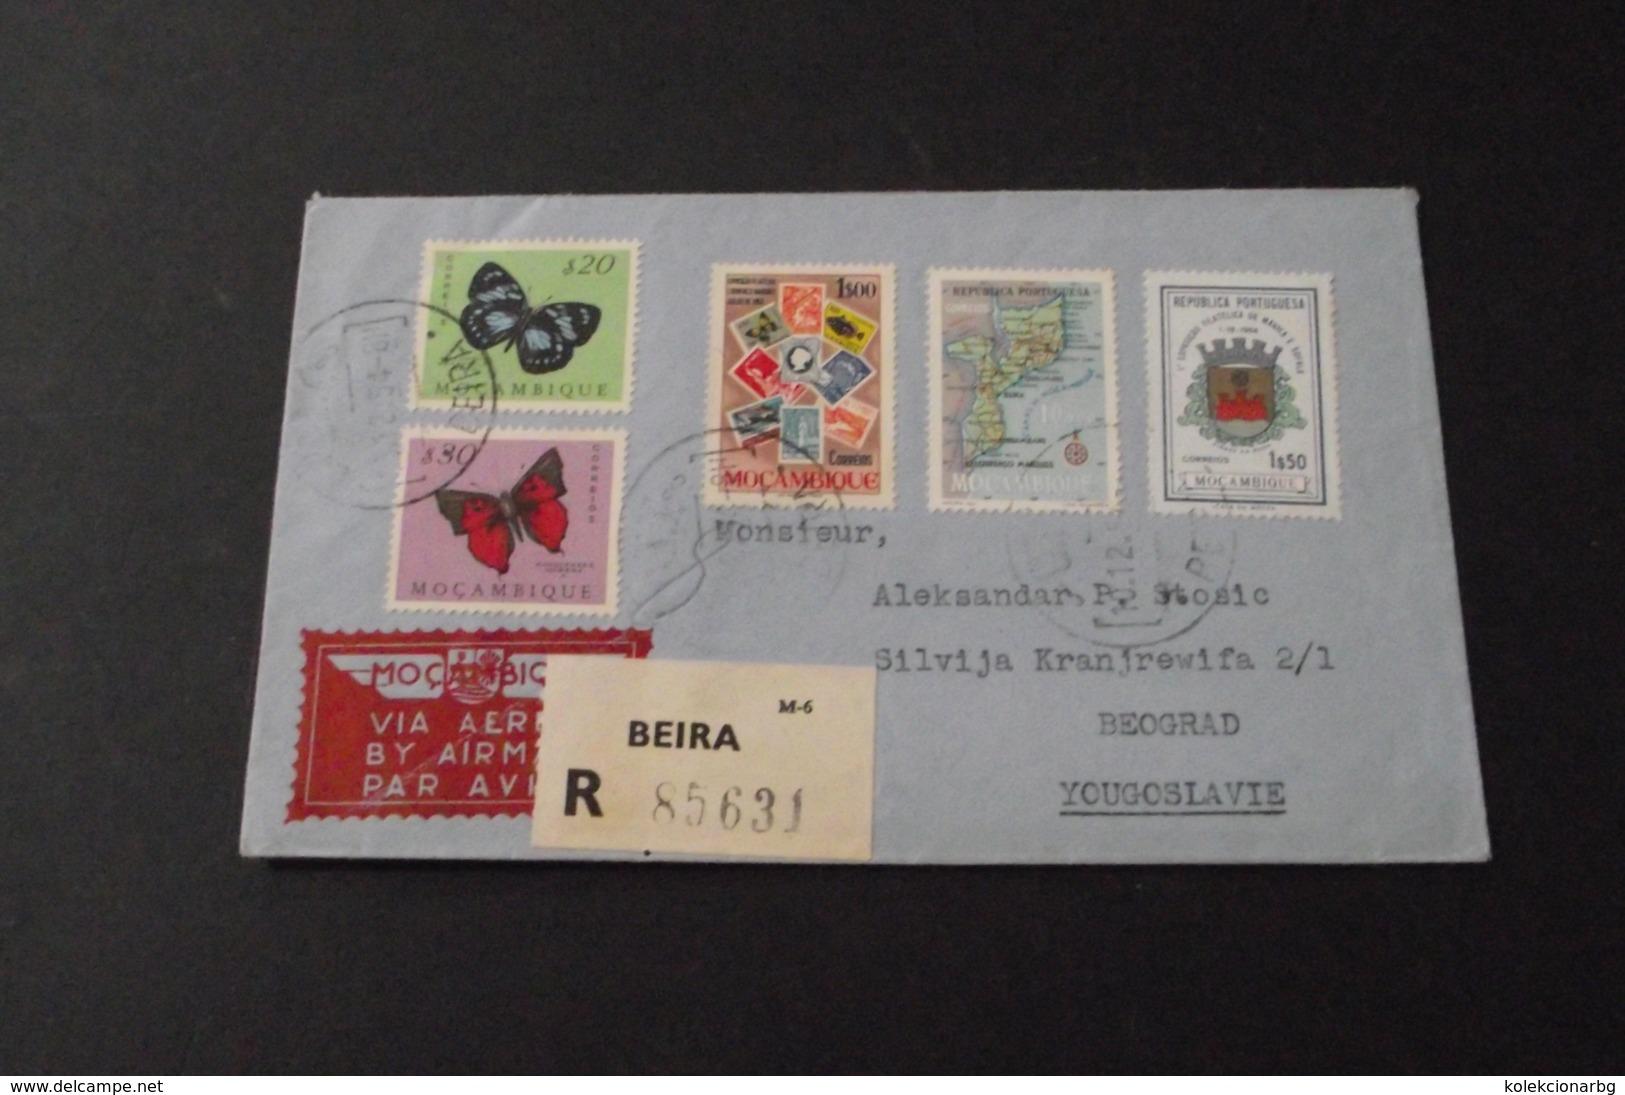 Avionsko Pismo Beira(Mozzambika)-Beograd(Yugoslavija) 1954.   Airmail Letter Mocambique-Yougoslavie - 1945-1992 Socialist Federal Republic Of Yugoslavia